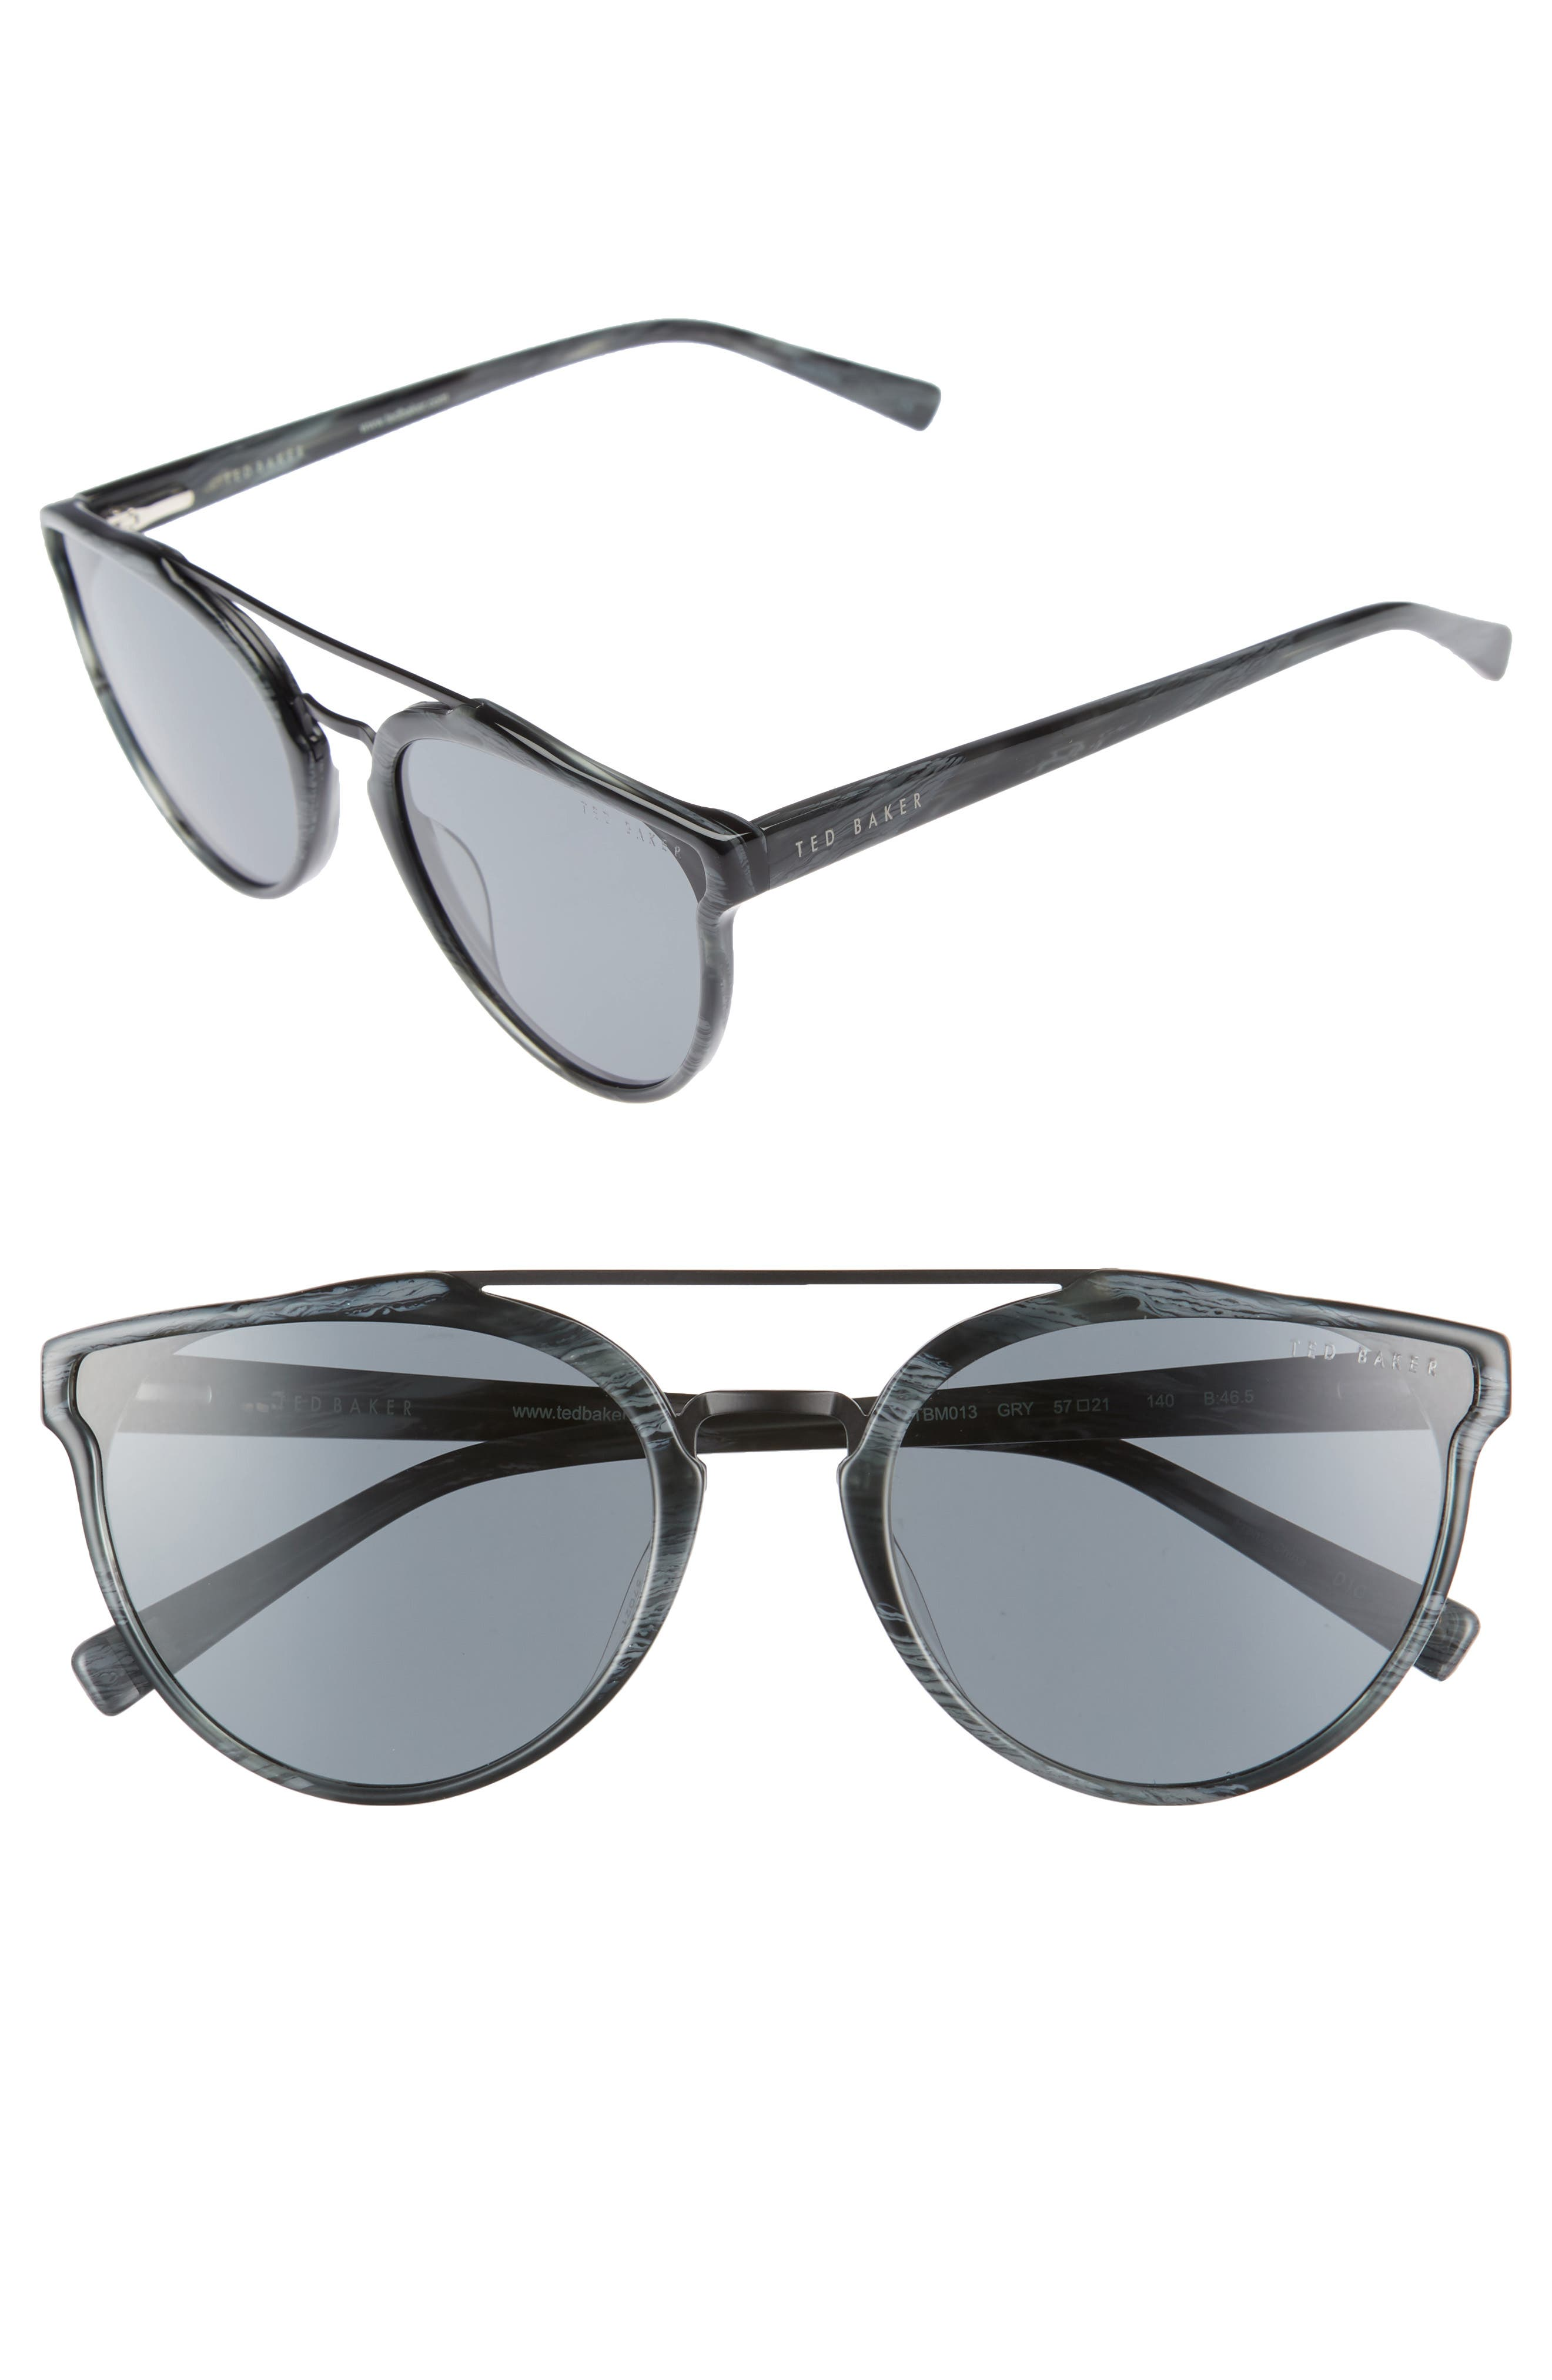 Alternate Image 1 Selected - Ted Baker London Retro 57mm Polarized Sunglasses